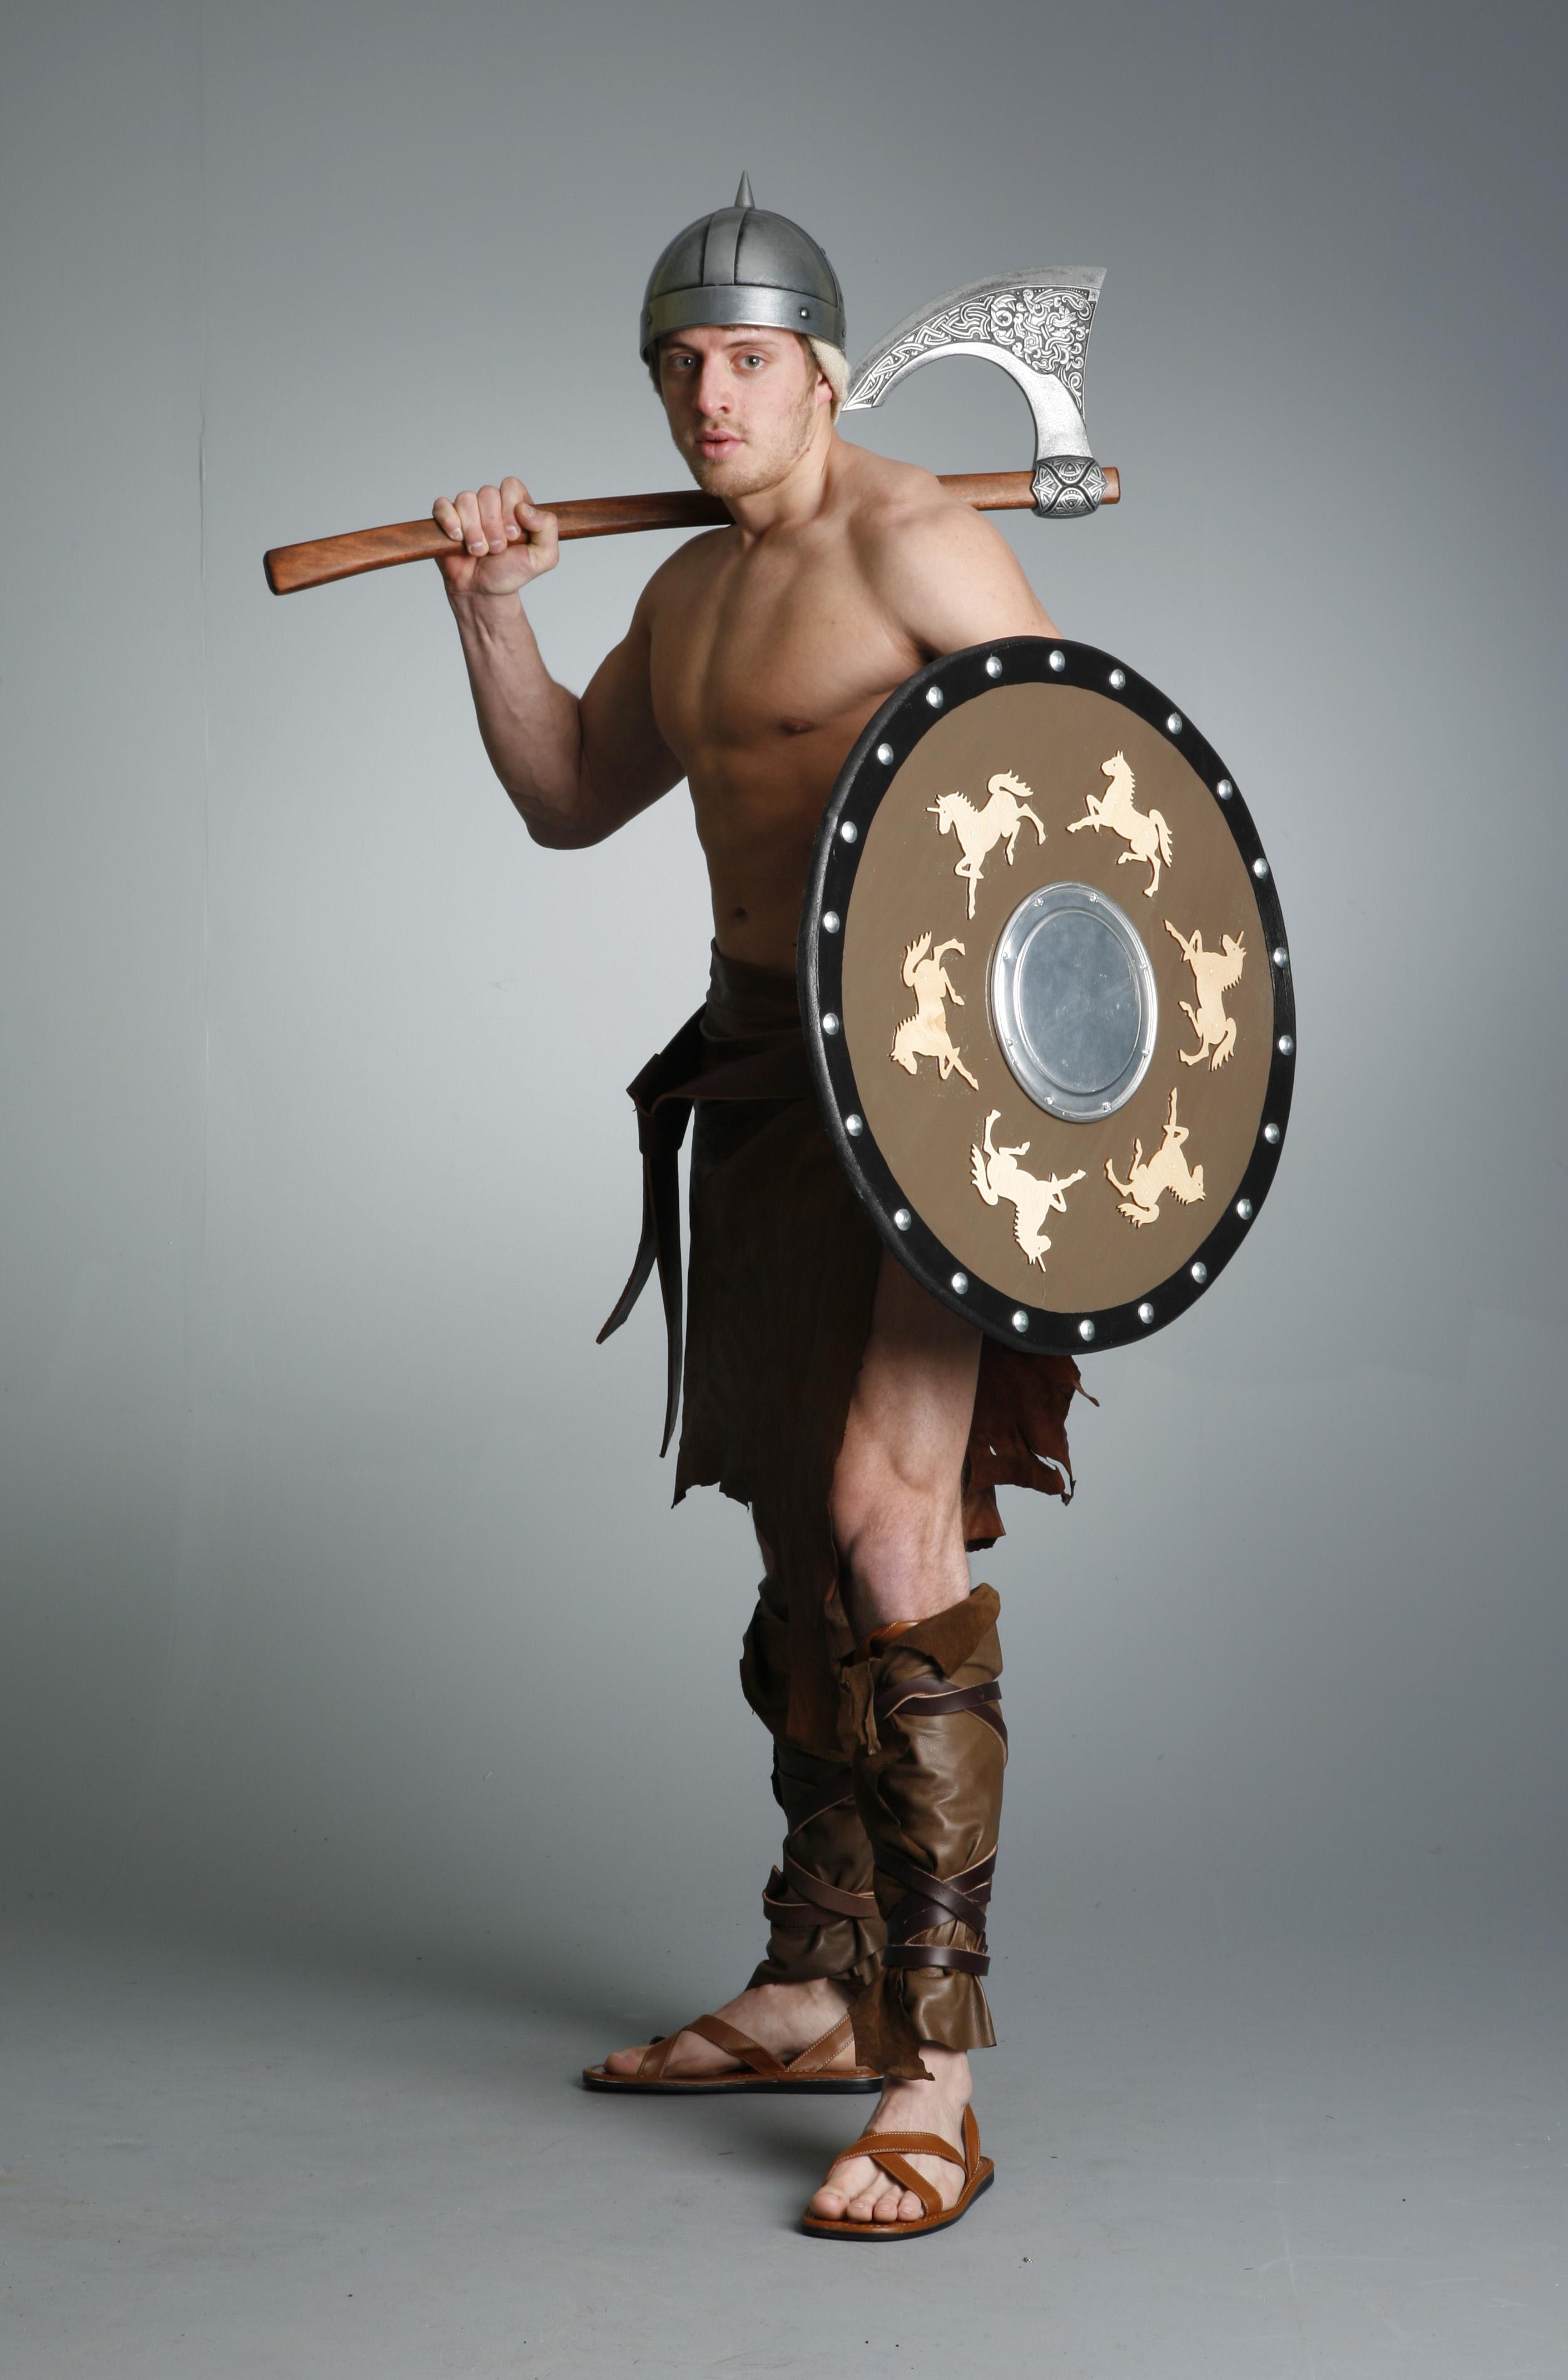 Barbarian Warrior J - 13 by mjranum-stock